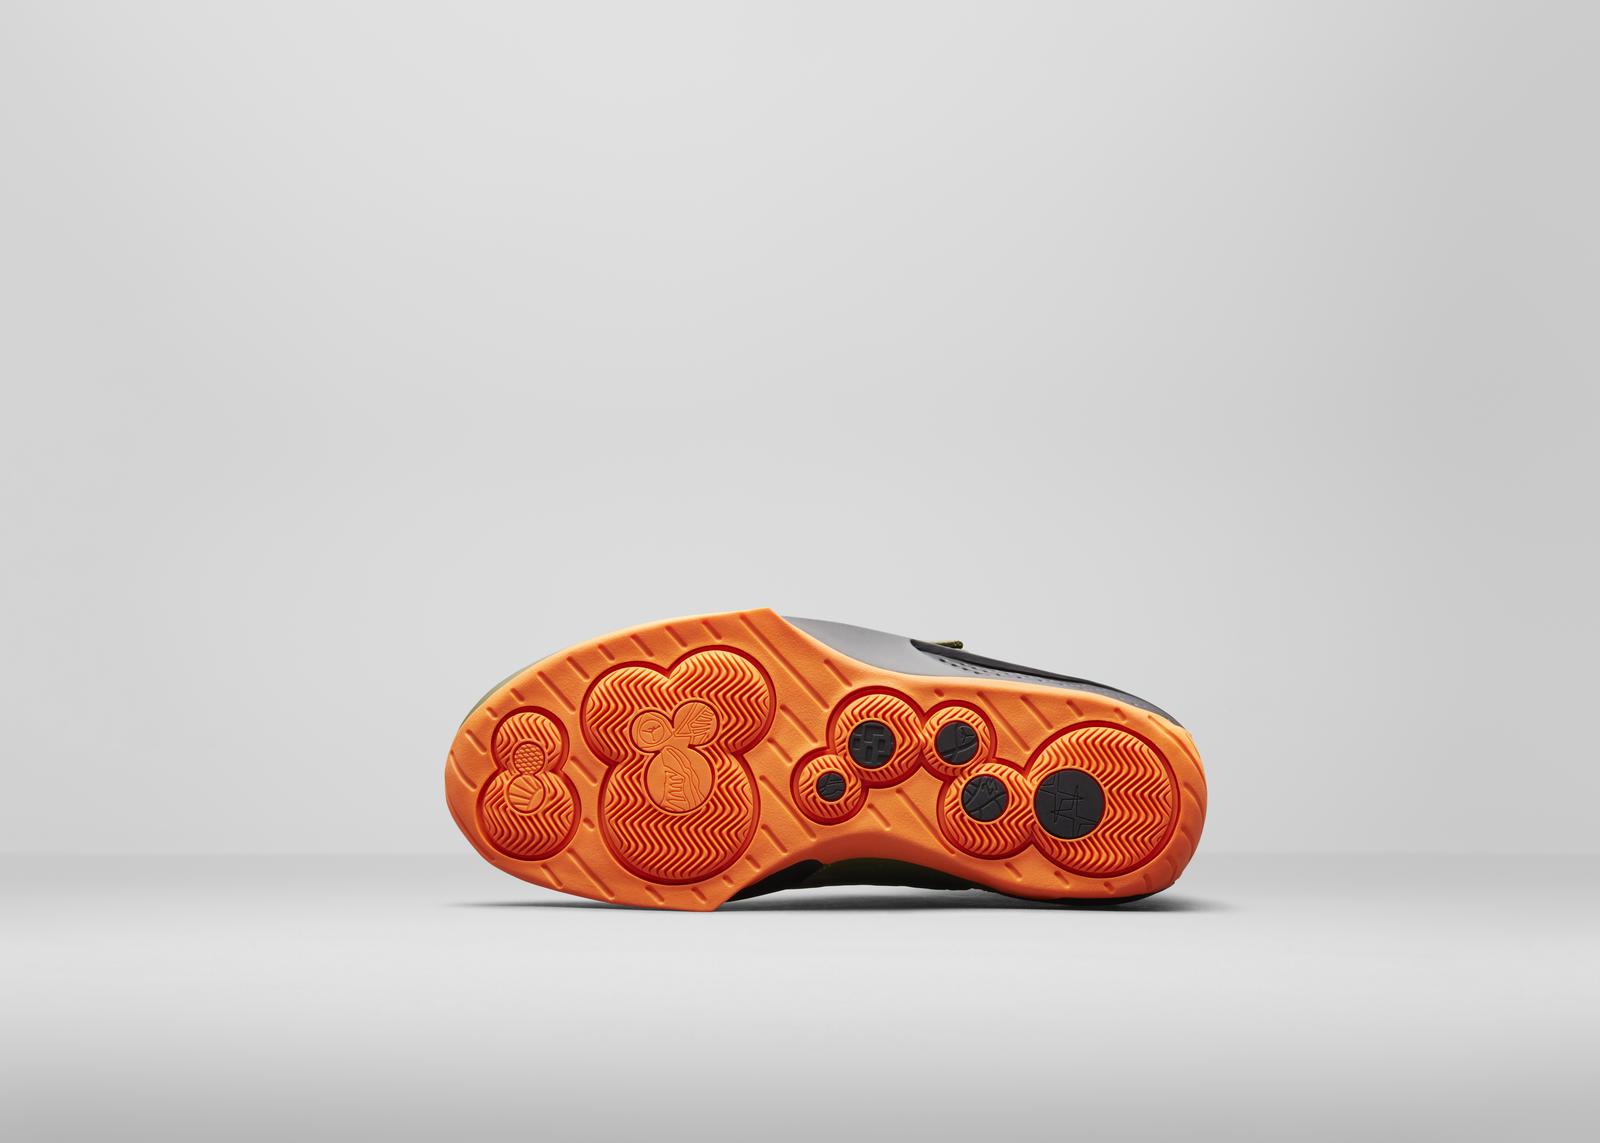 f1e499031b55 Jordan Brand x Carmelo Anthony x Rag   Bone Capsule - Nike News